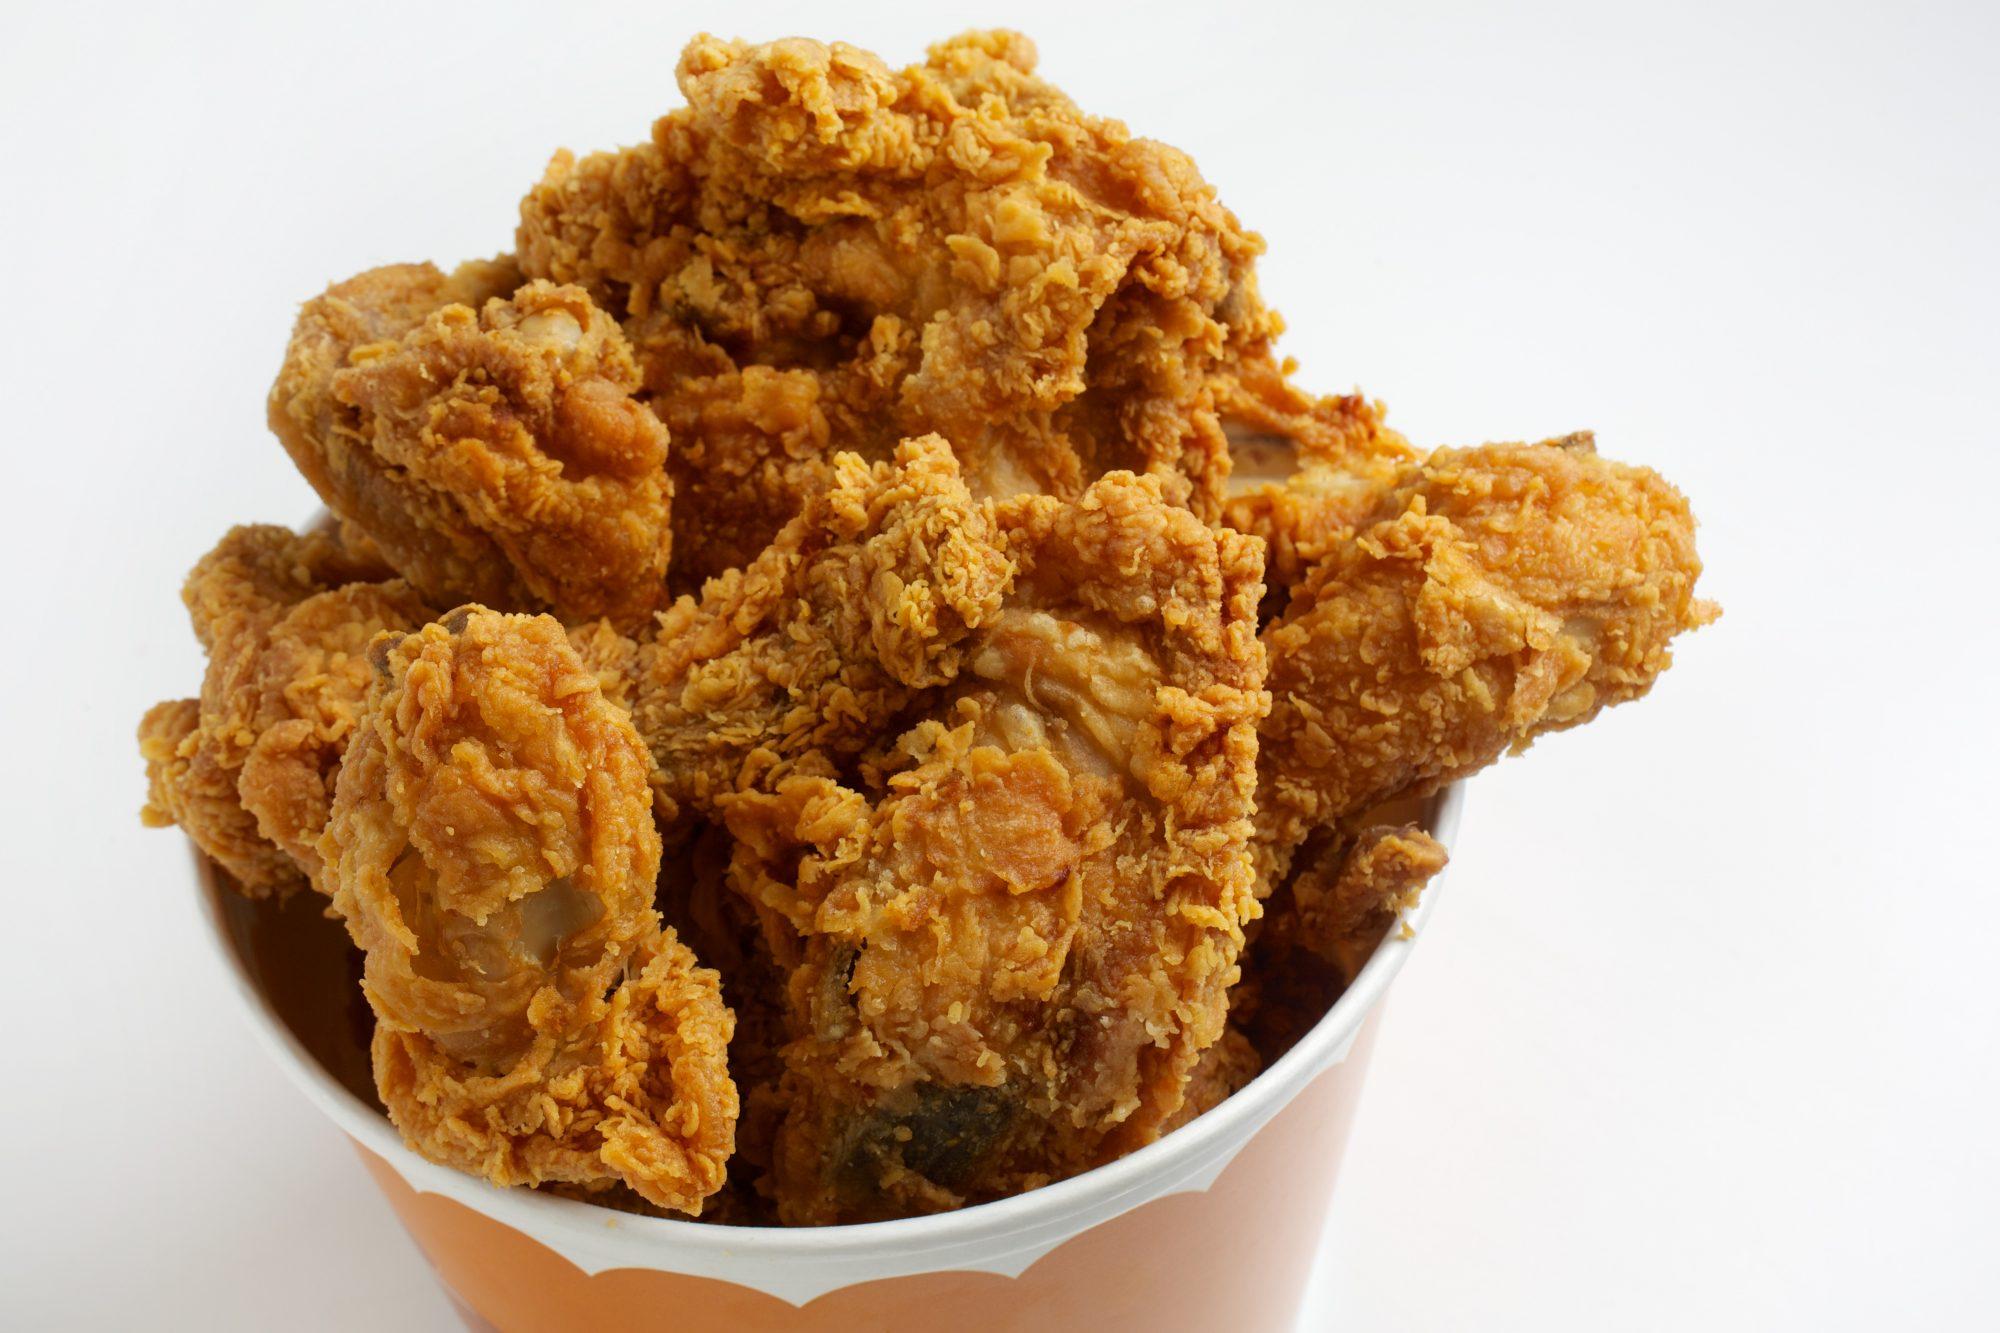 getty-fried-chicken-image